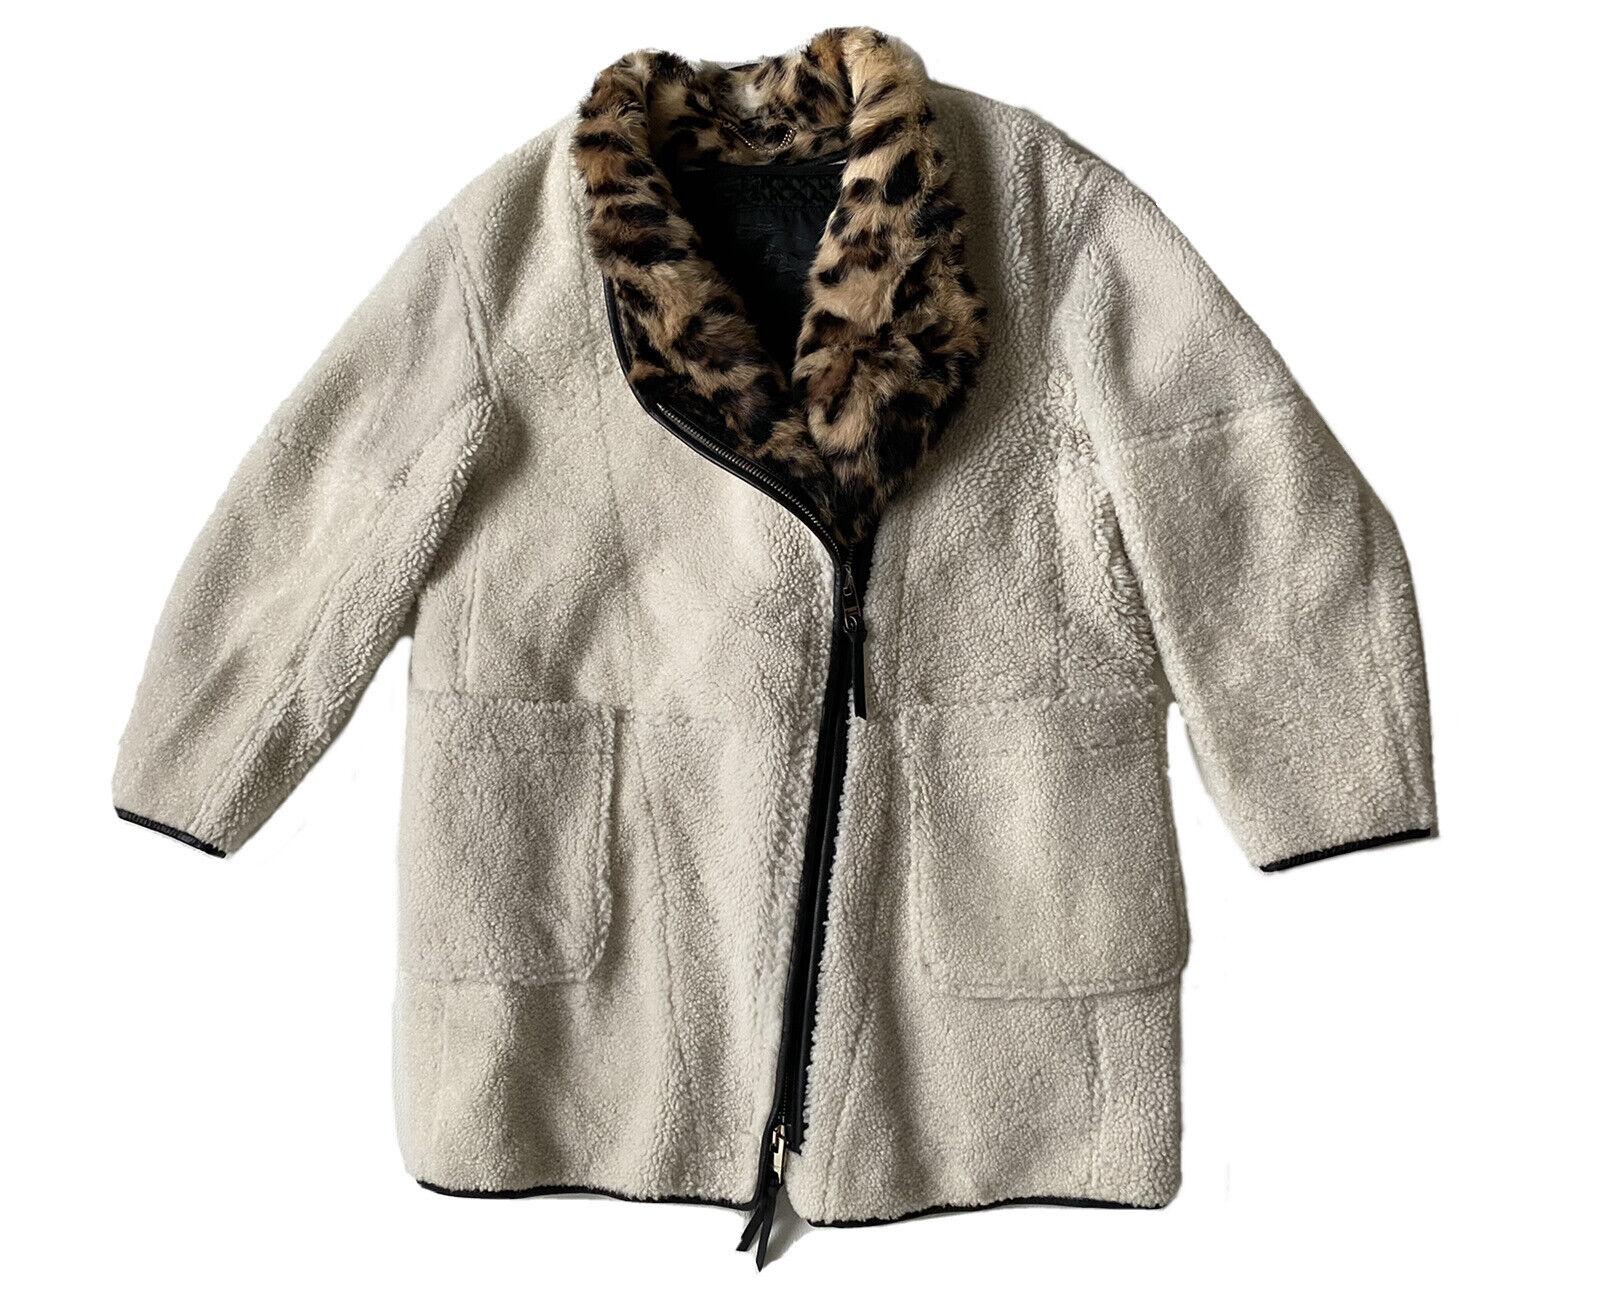 Rare manteau burberry prorsum mouton shearling fourrure léopard 42 ita (38/40)